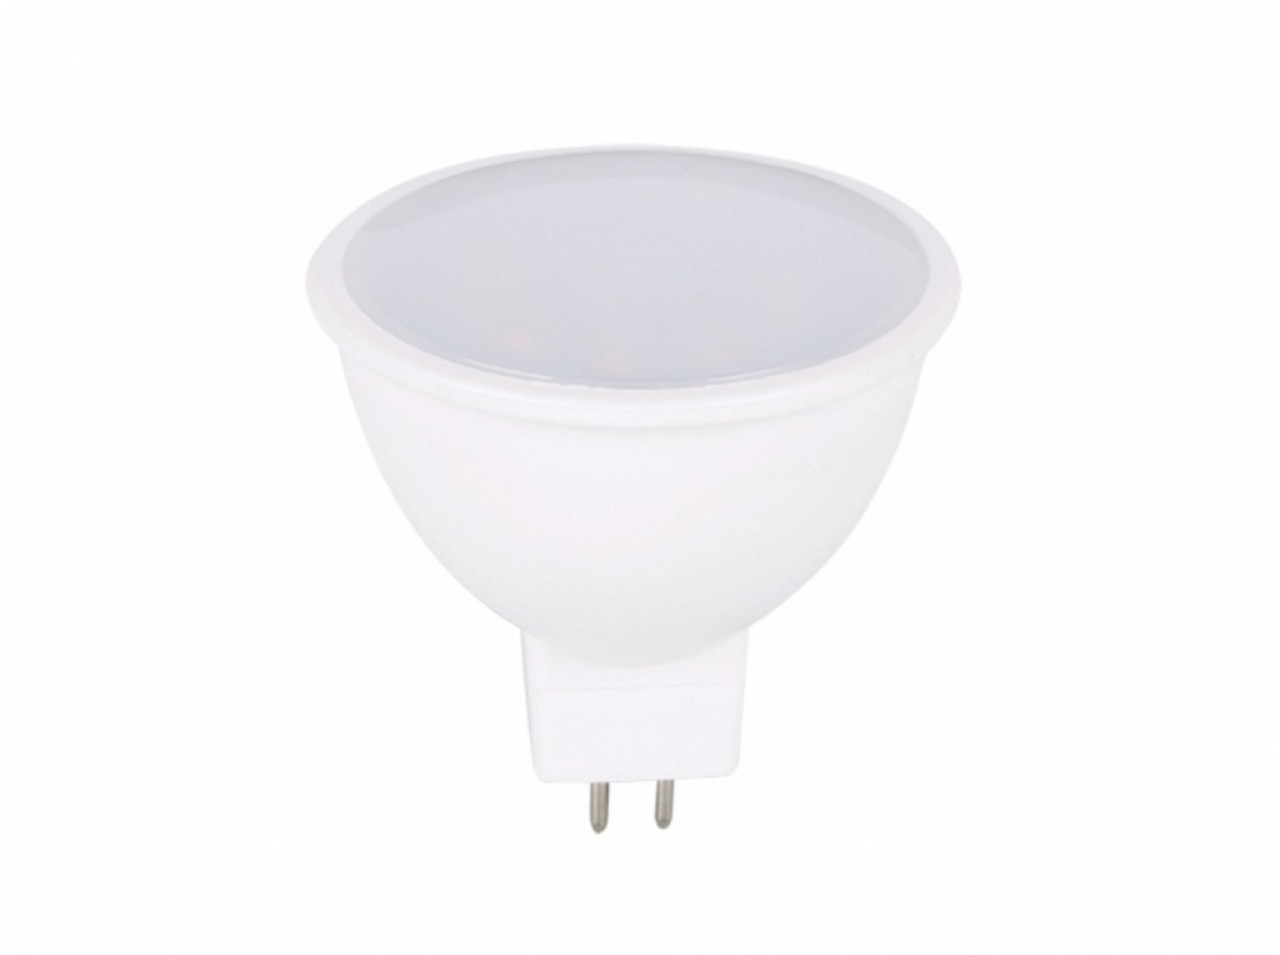 Светодиодная лампа  DELUX MR16A 5Вт GU5.3 белый